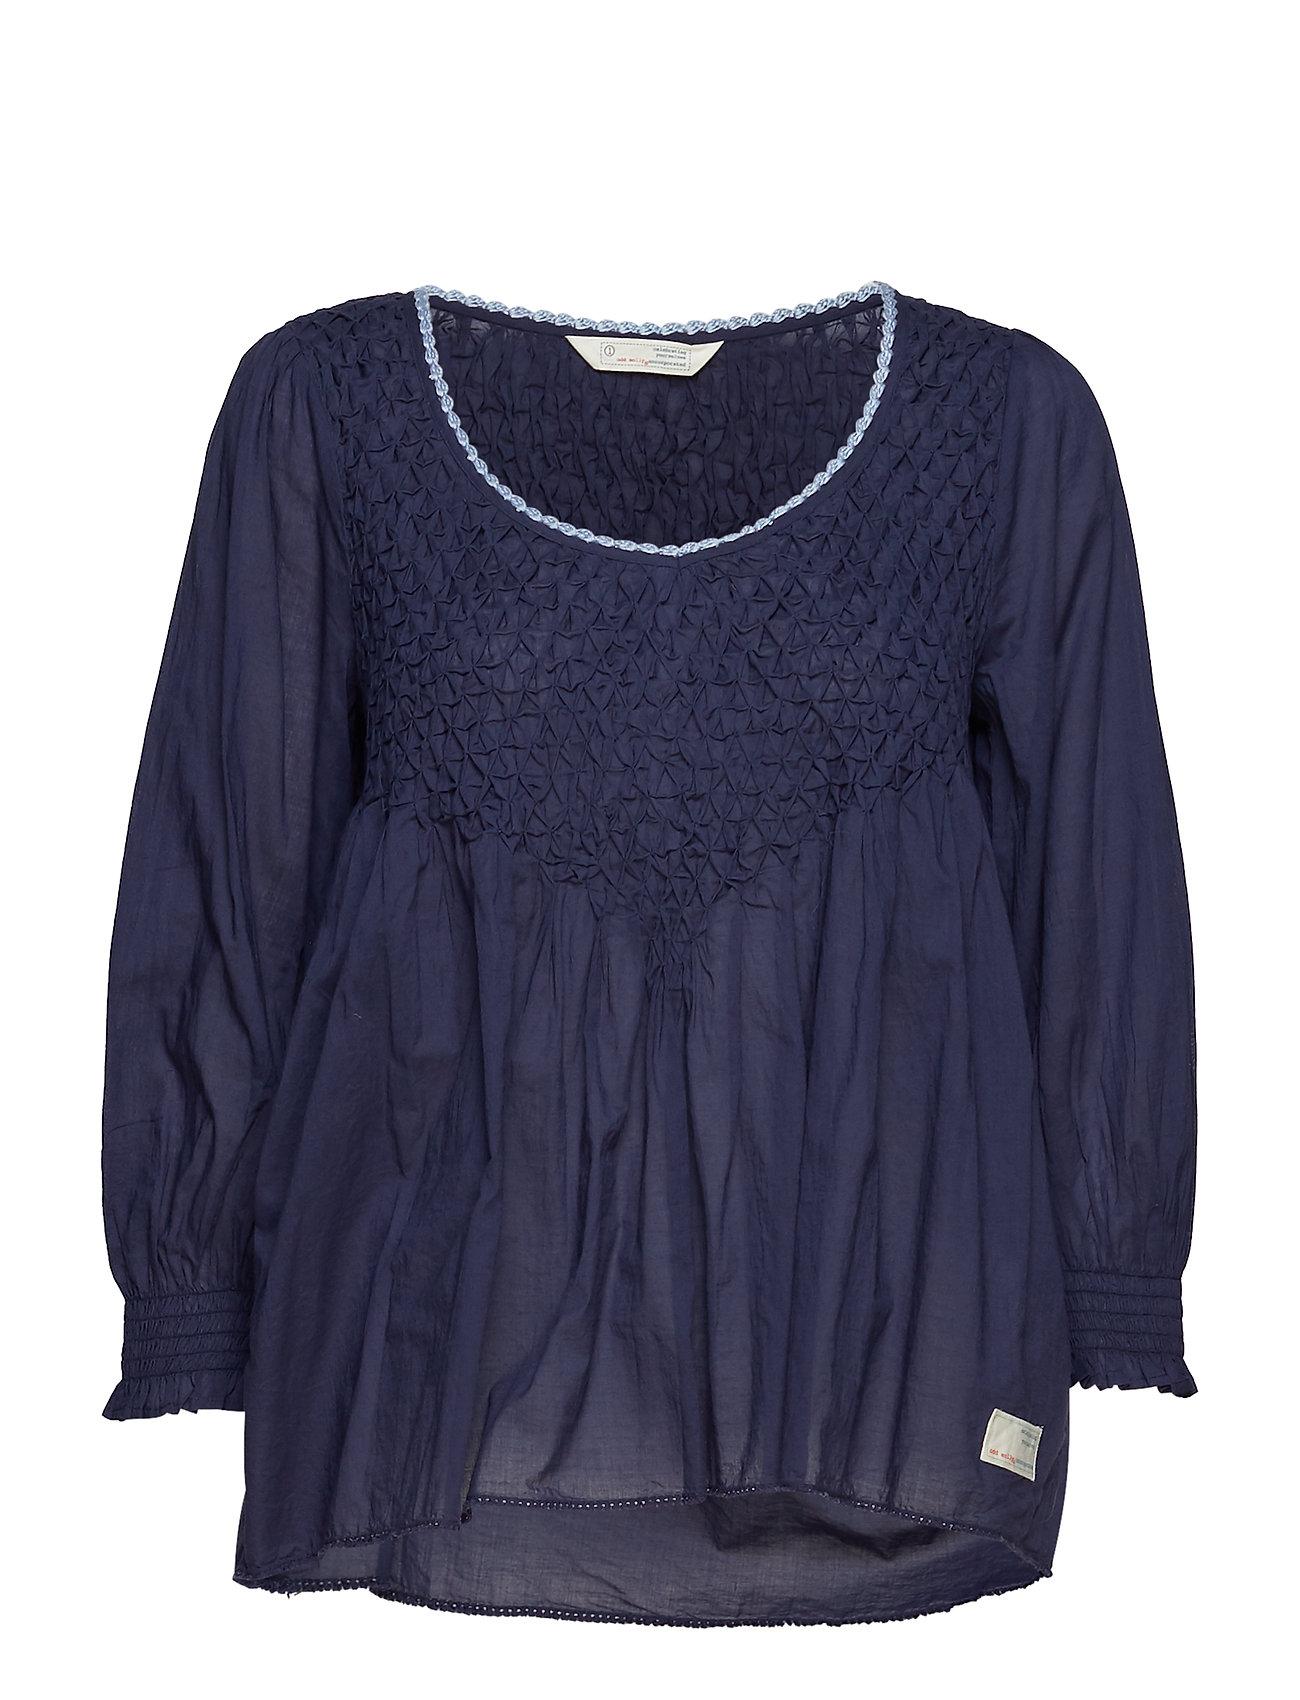 ODD MOLLY sway blouse - DARK BLUE